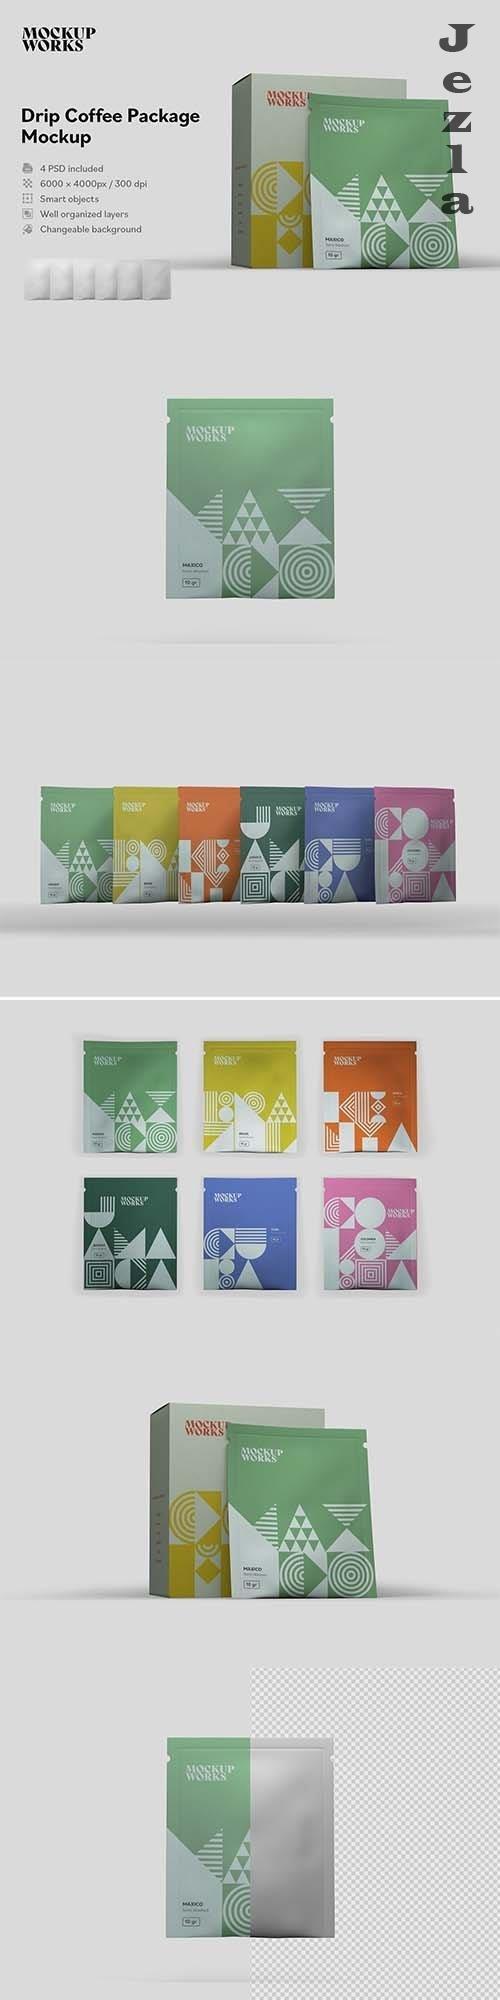 CreativeMarket - Drip Coffee Package Mockup 5877145